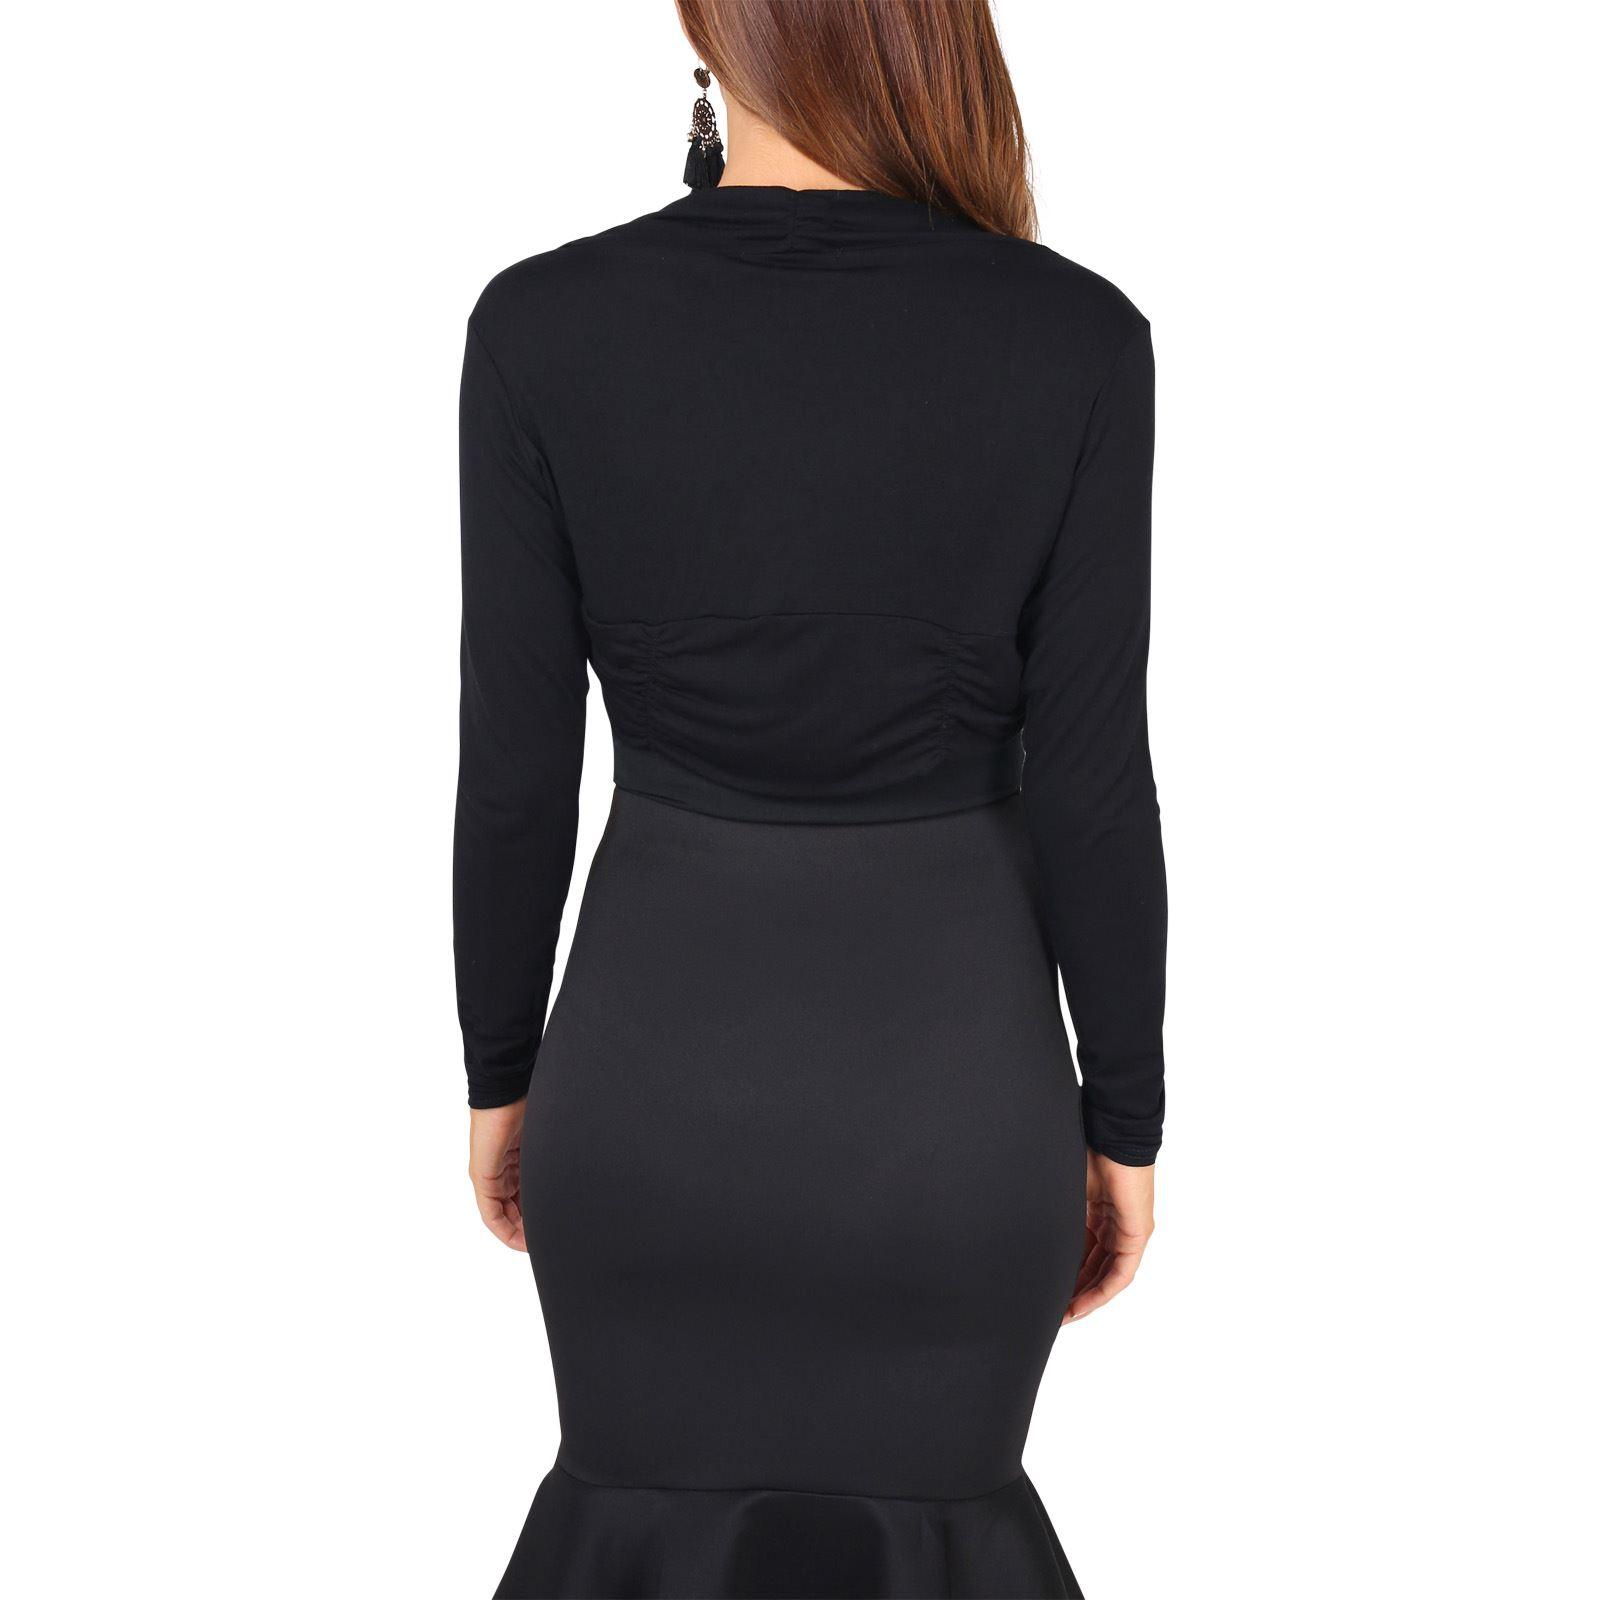 Femme-Bolero-Cardigan-Gilet-Dentelle-Crochet-Soiree-Classique-Uni-Court-Elegant miniature 11